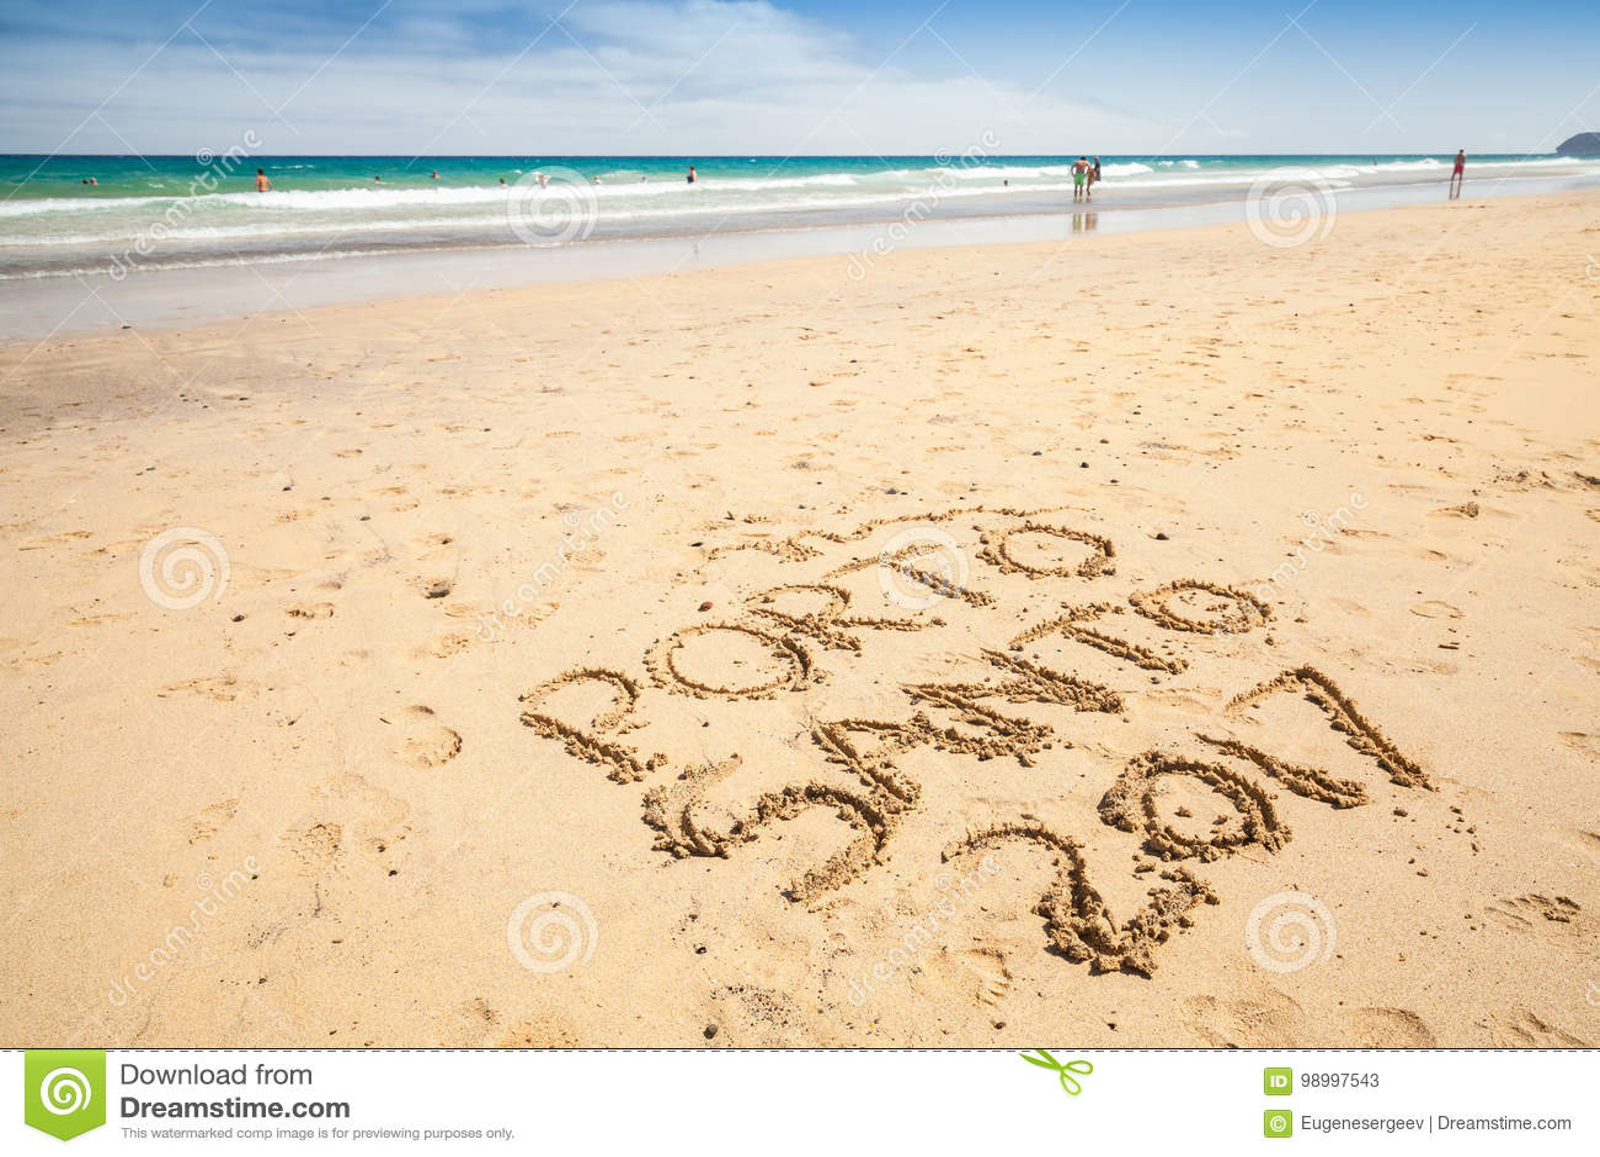 Writings On The Sand. Beach Of Porto Santo Island Stock Image ... b5ec06742db